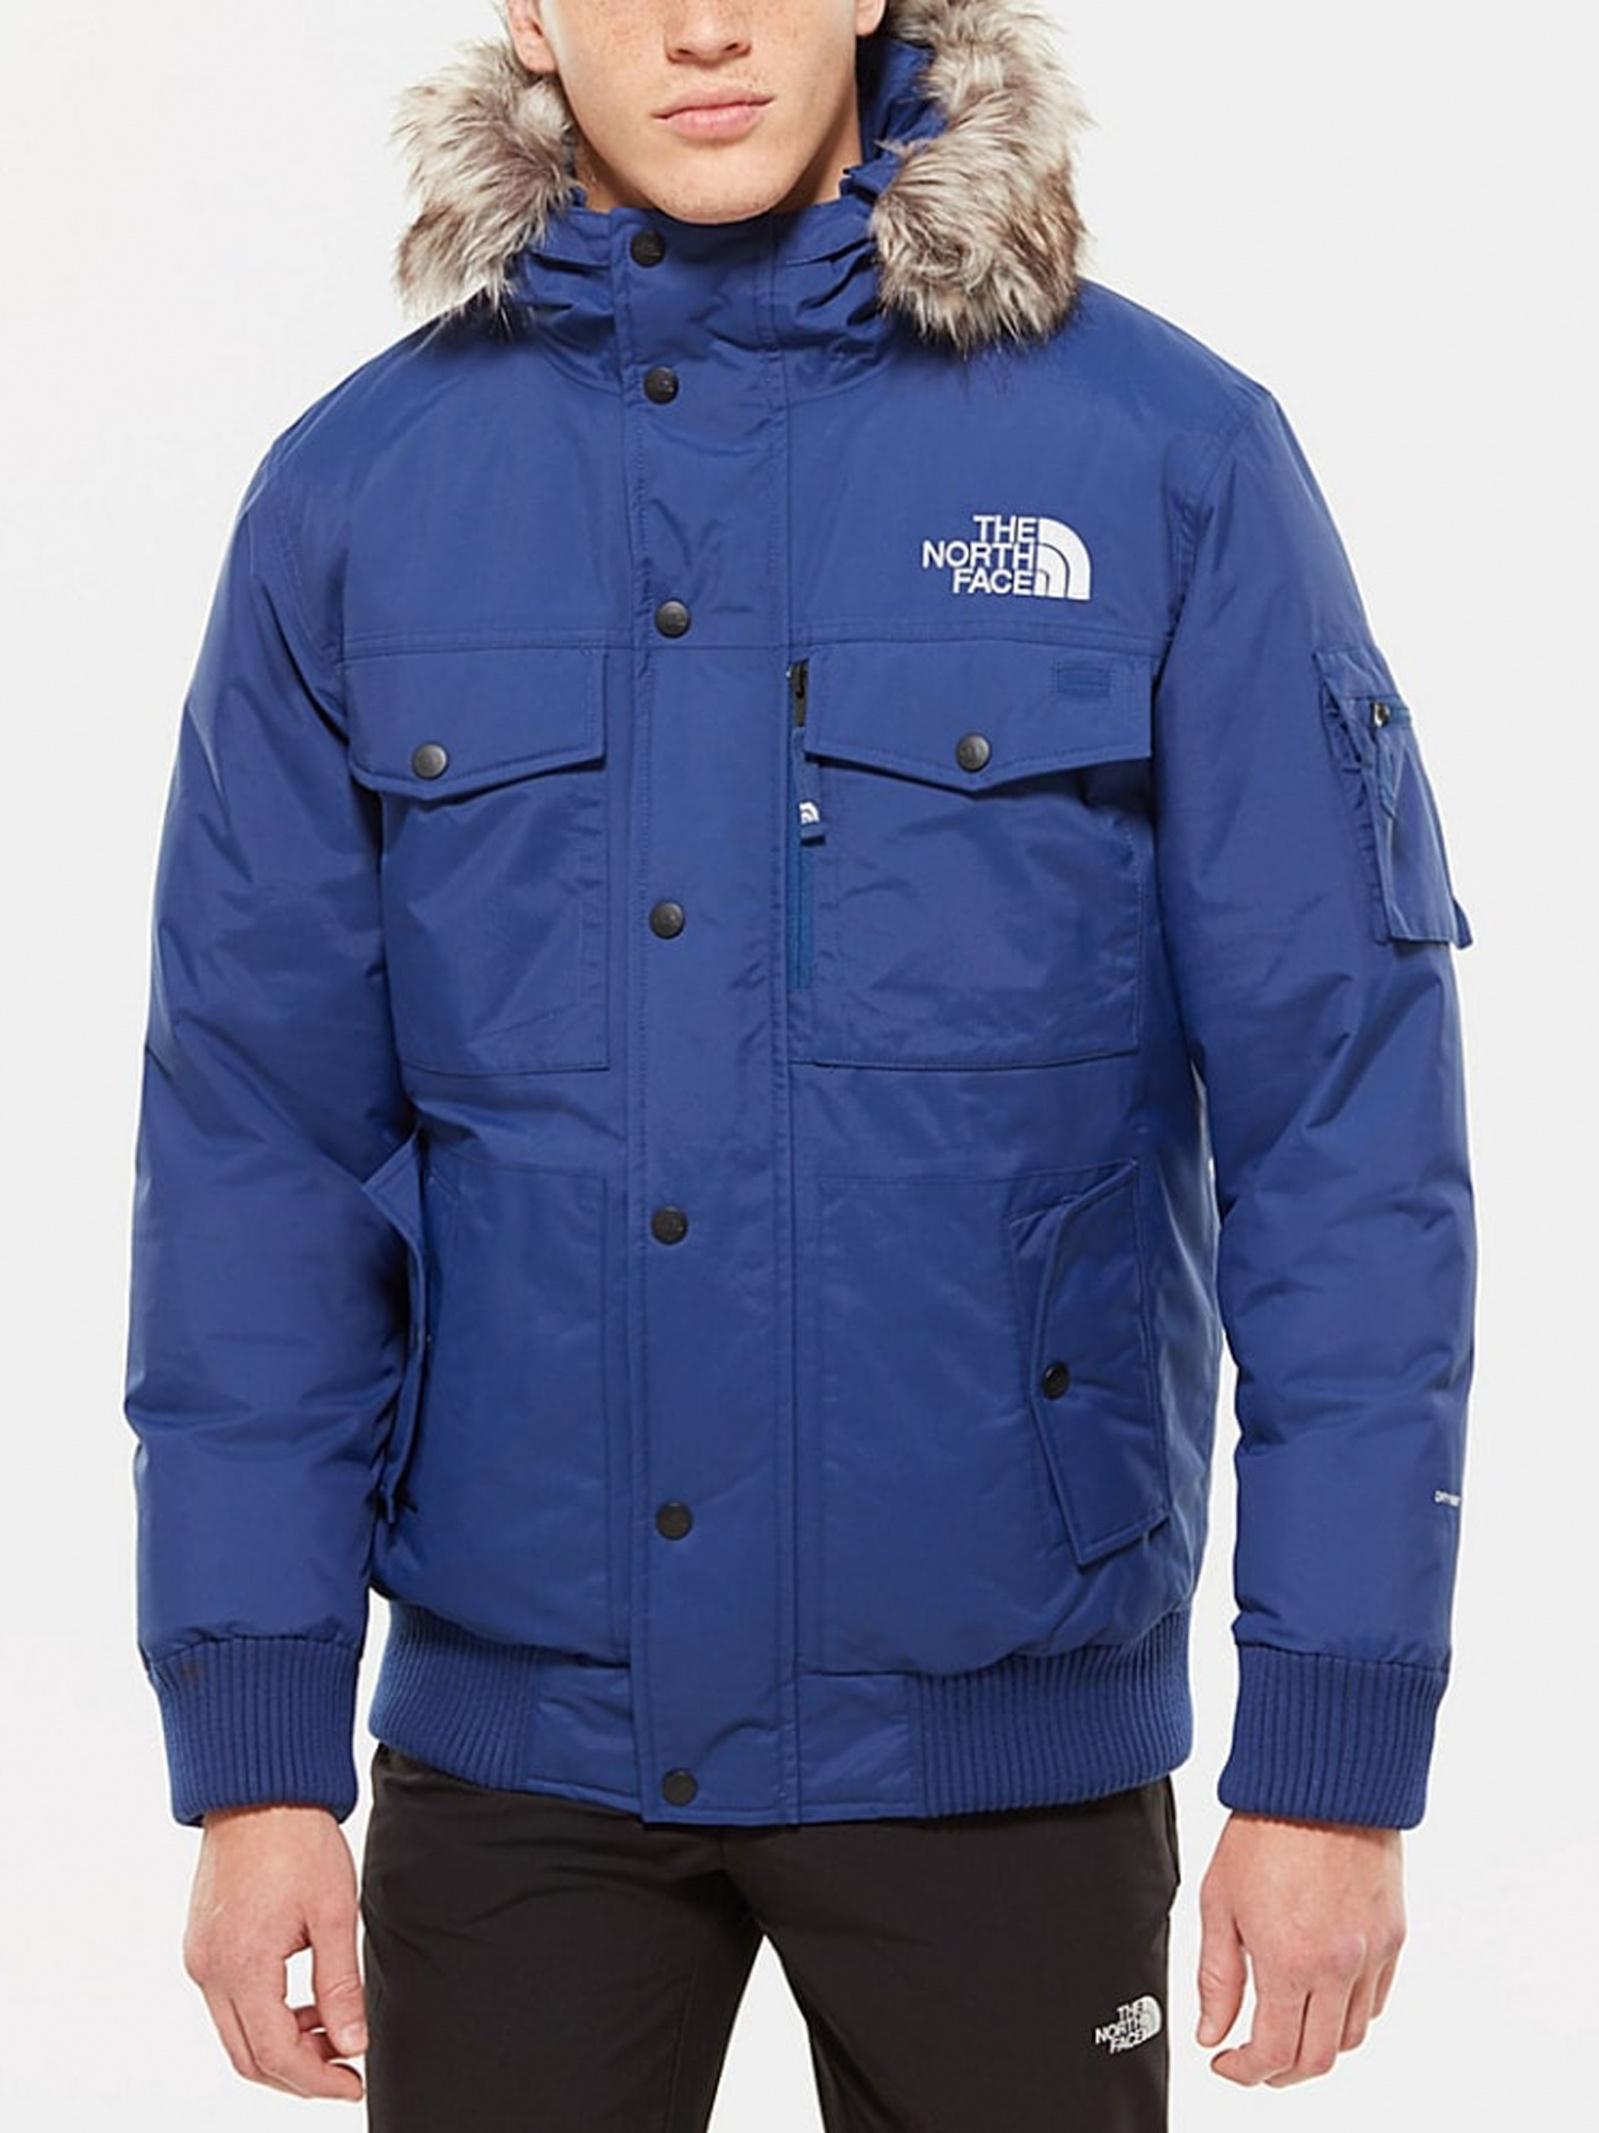 Куртка пуховая мужские The North Face модель N256 характеристики, 2017